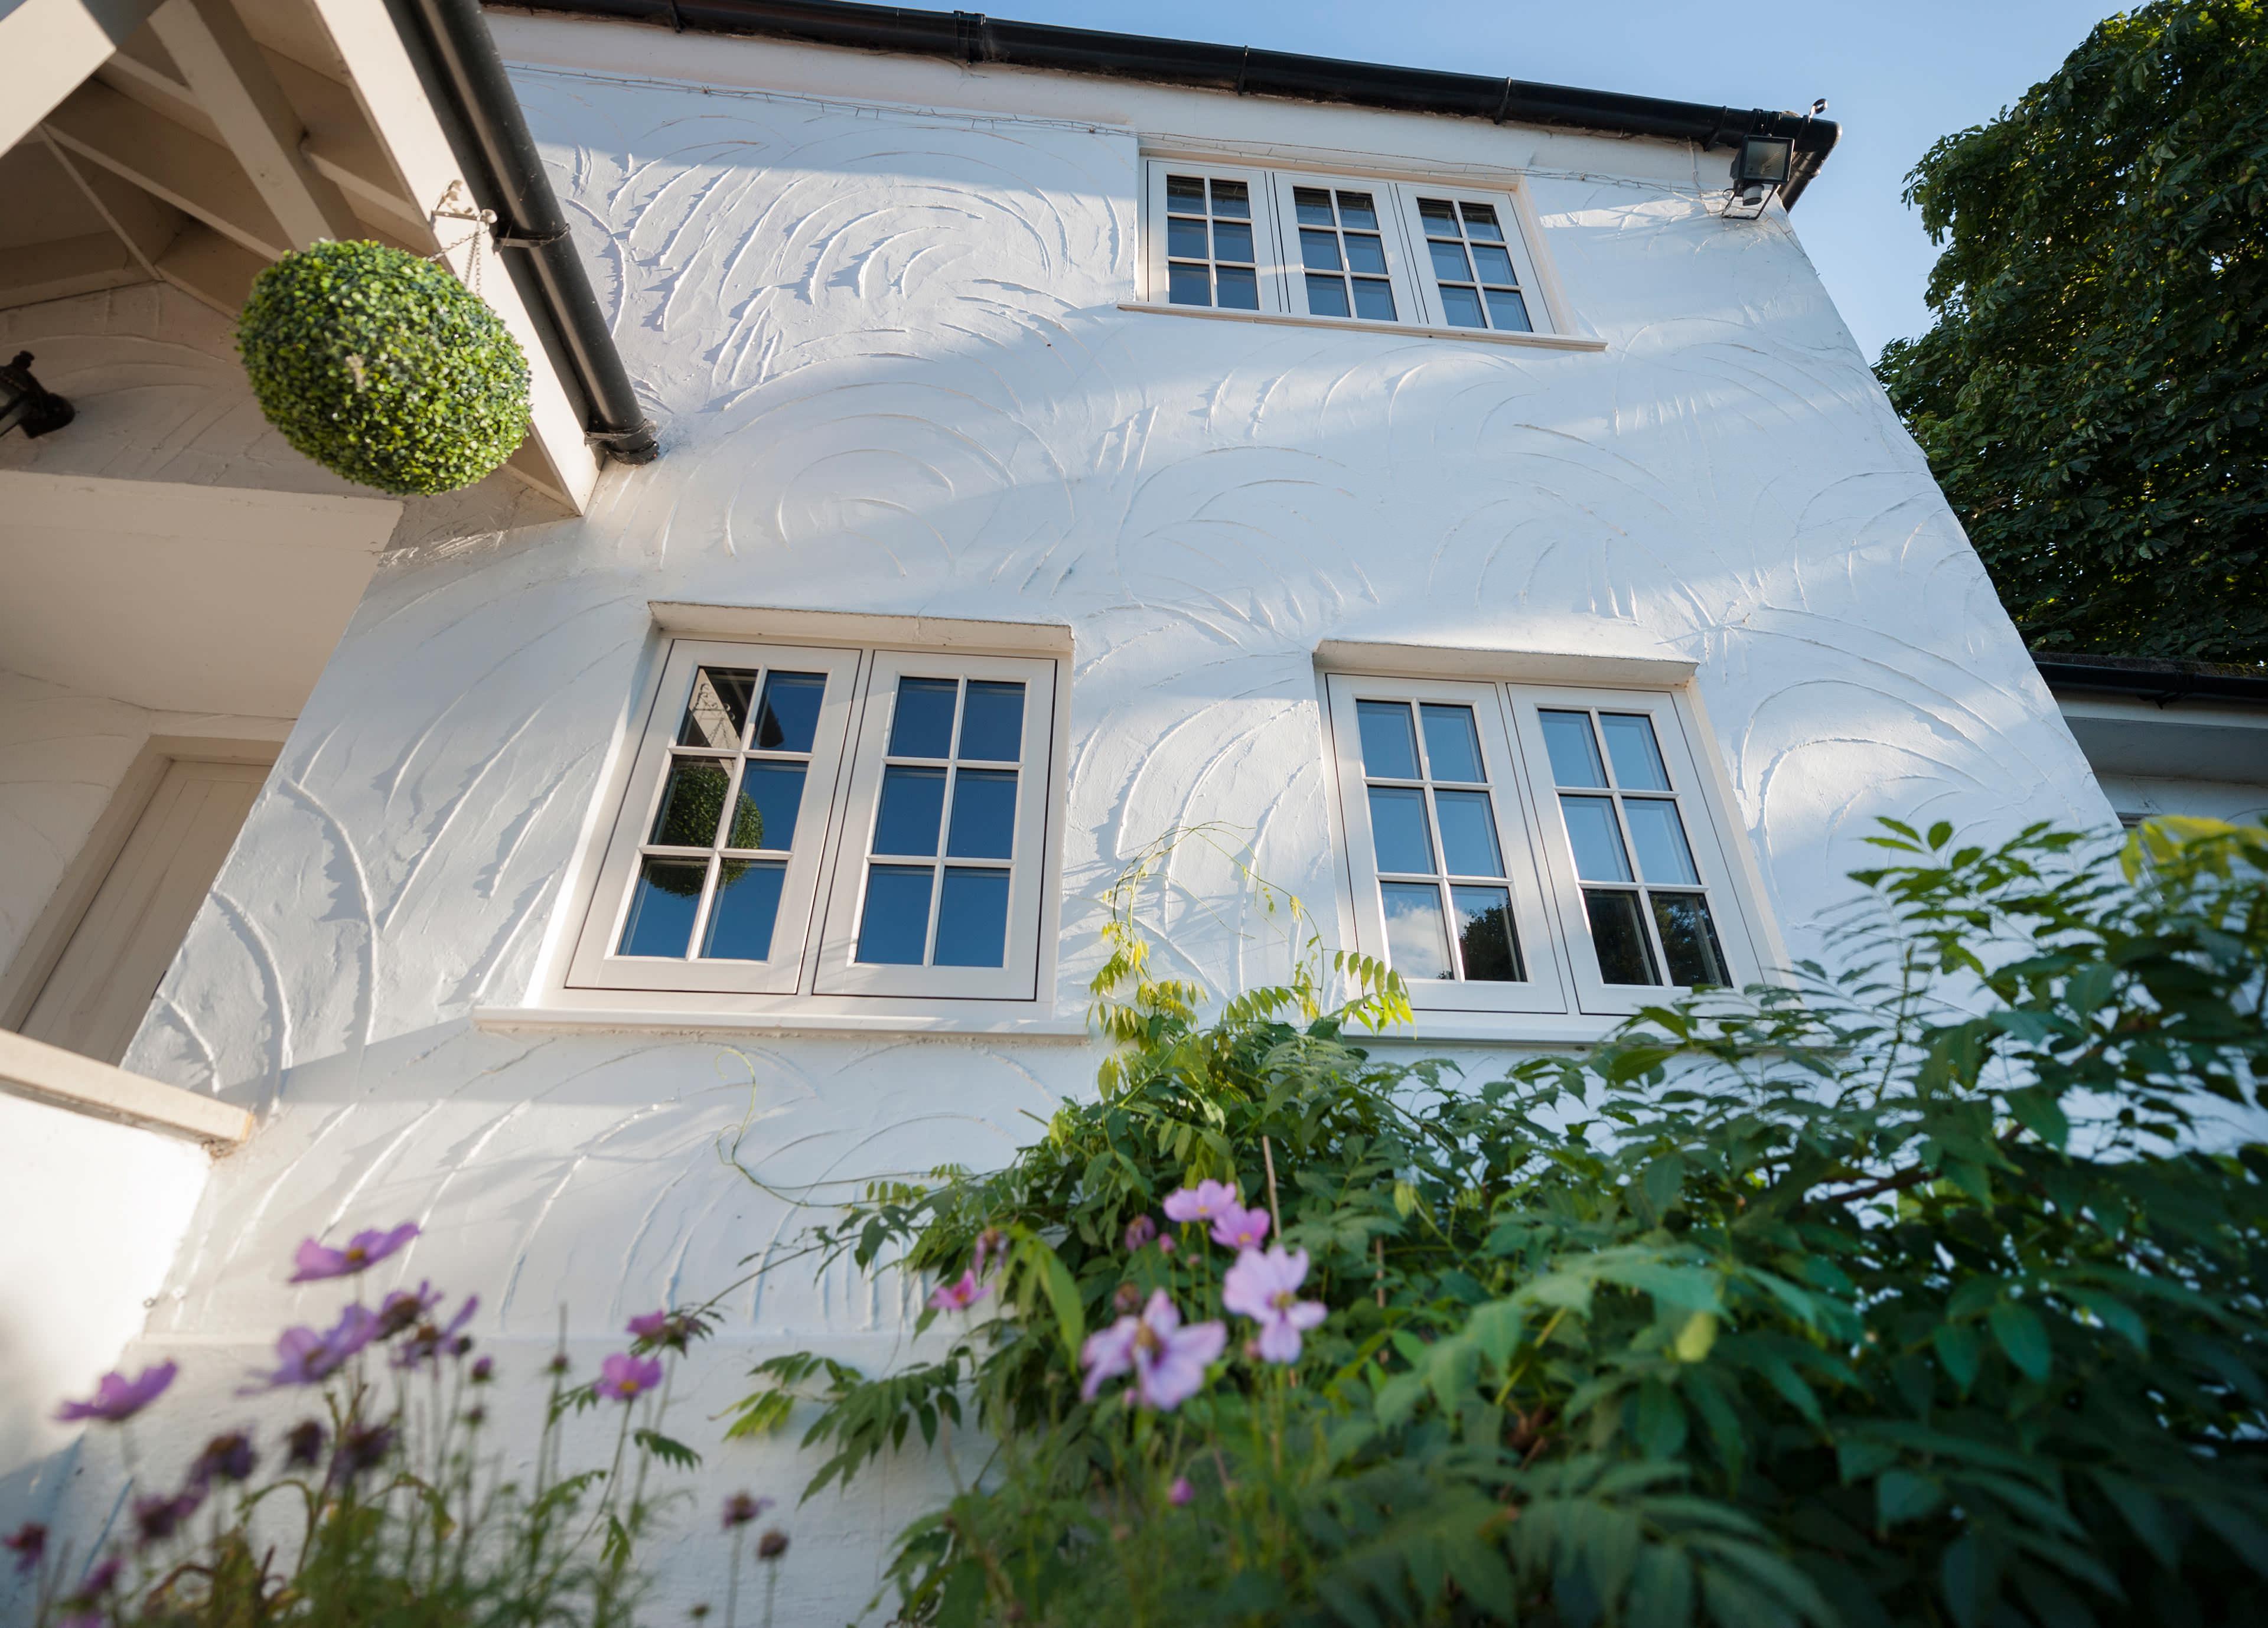 Residence 9 Windows Installed in Leominster